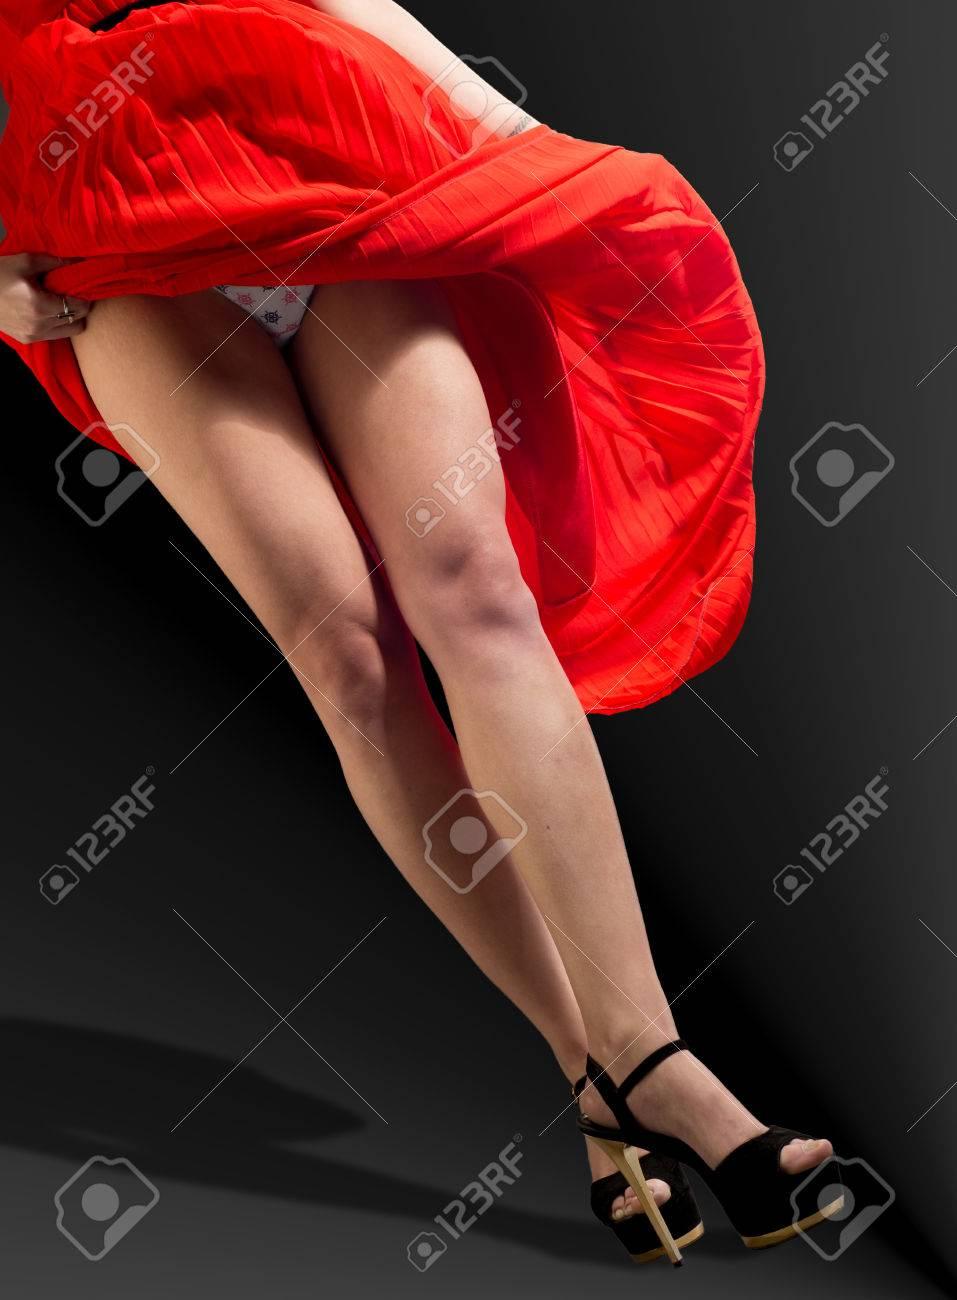 Legs Dress Panties Pictures